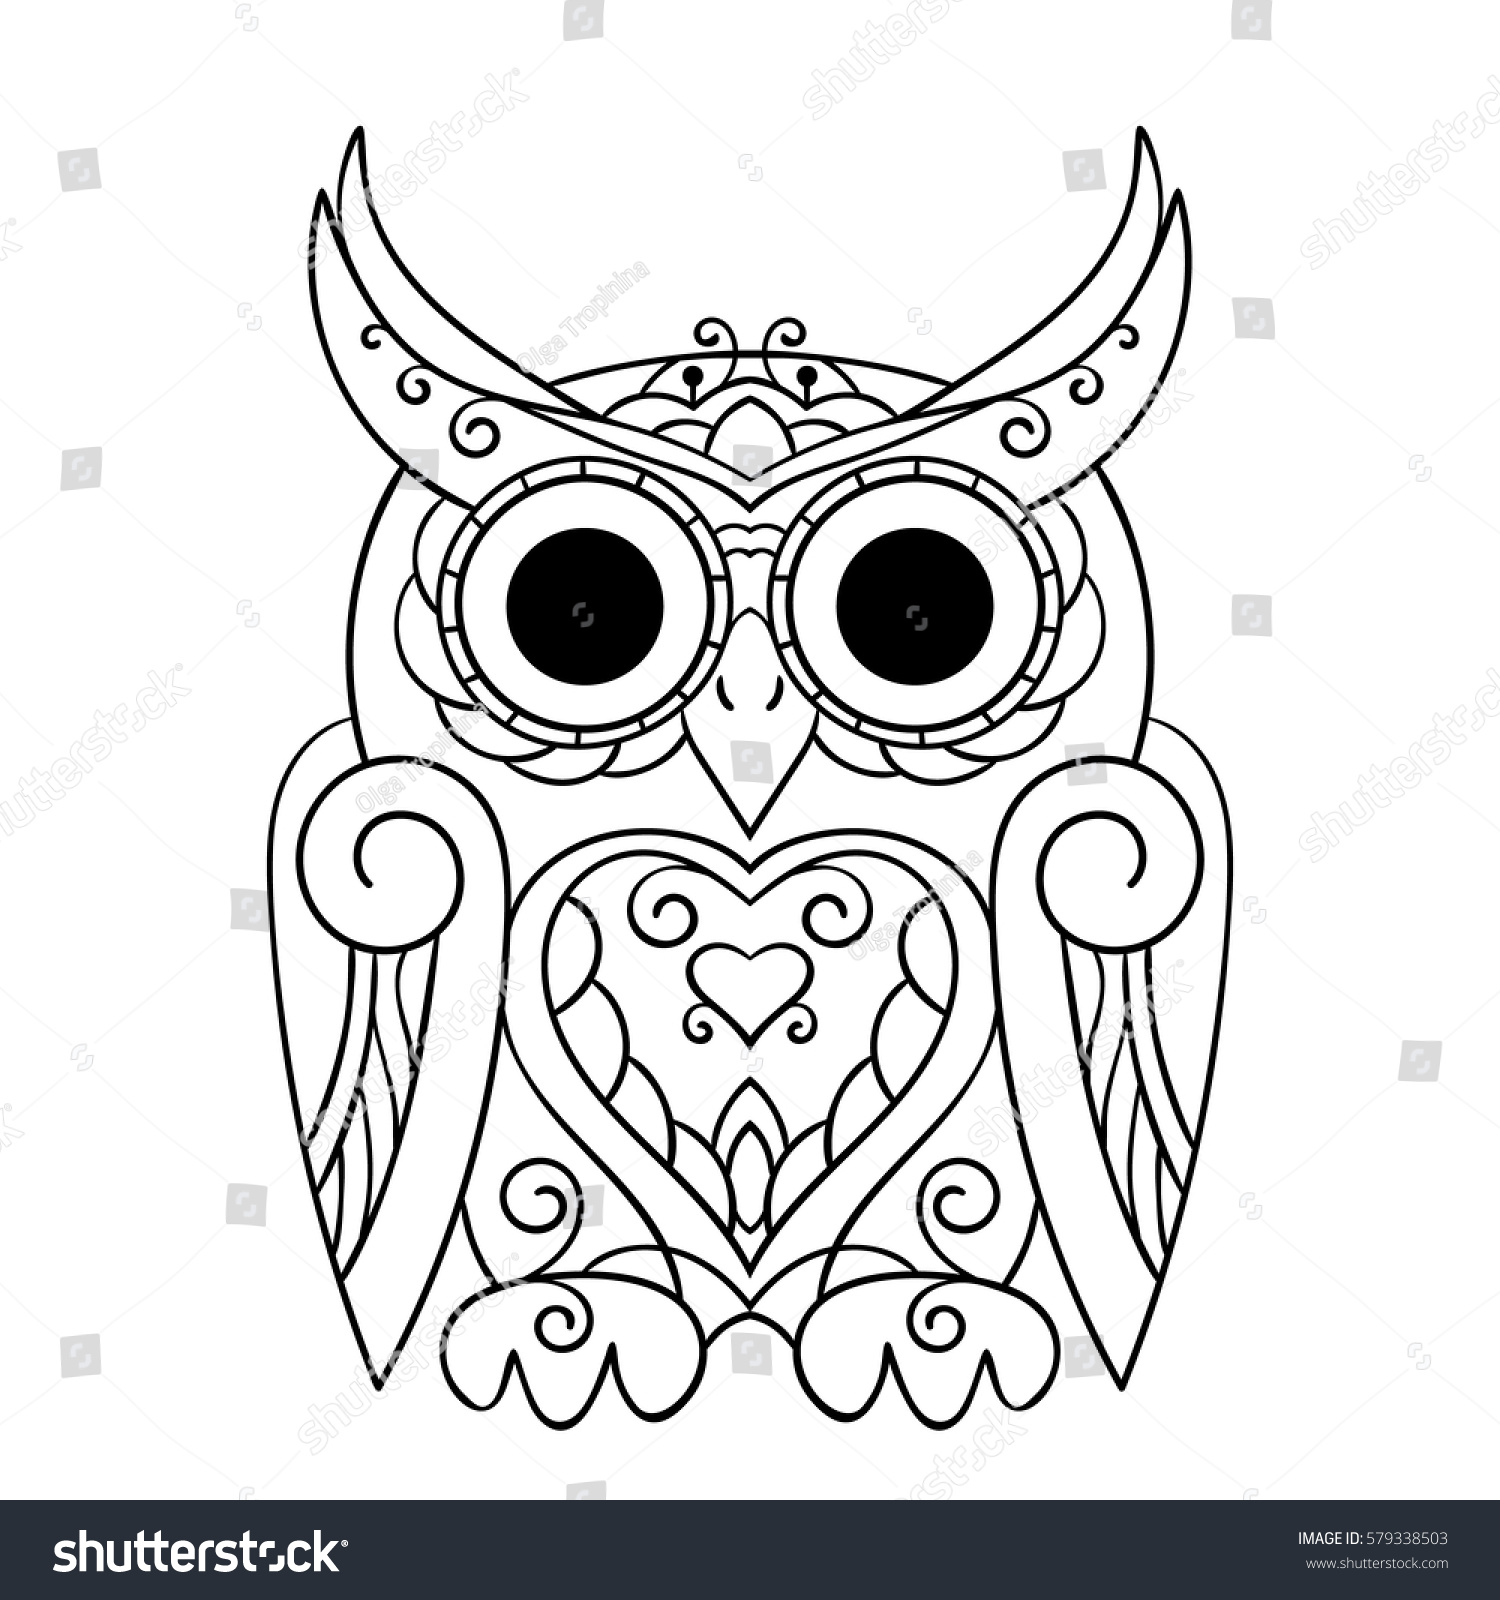 Zen coloring books for children - Vector Hand Drawn Owl For Adult And Children Coloring Book Black And White Zentangle Art